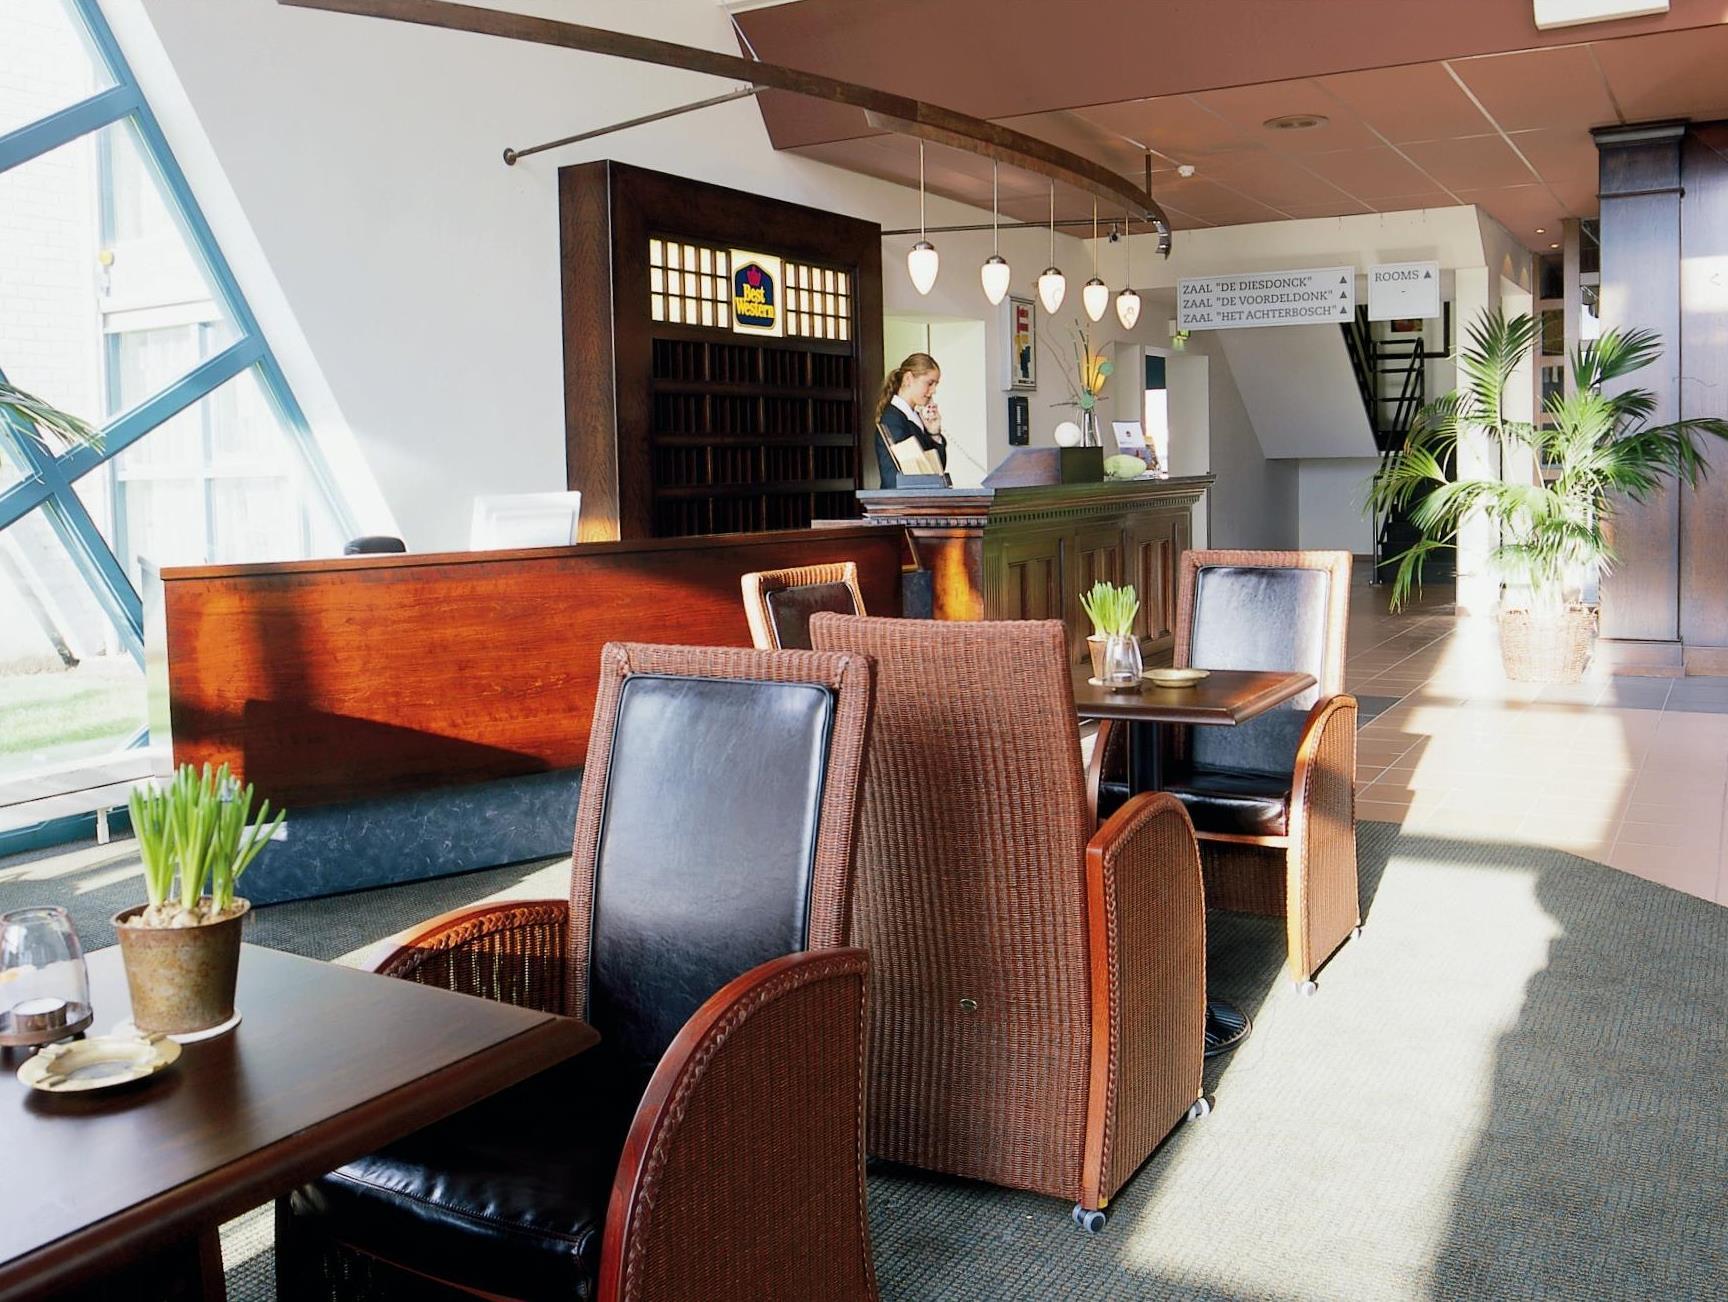 Best Western Hotel Nobis Eindhoven Venlo A67 In Asten Room